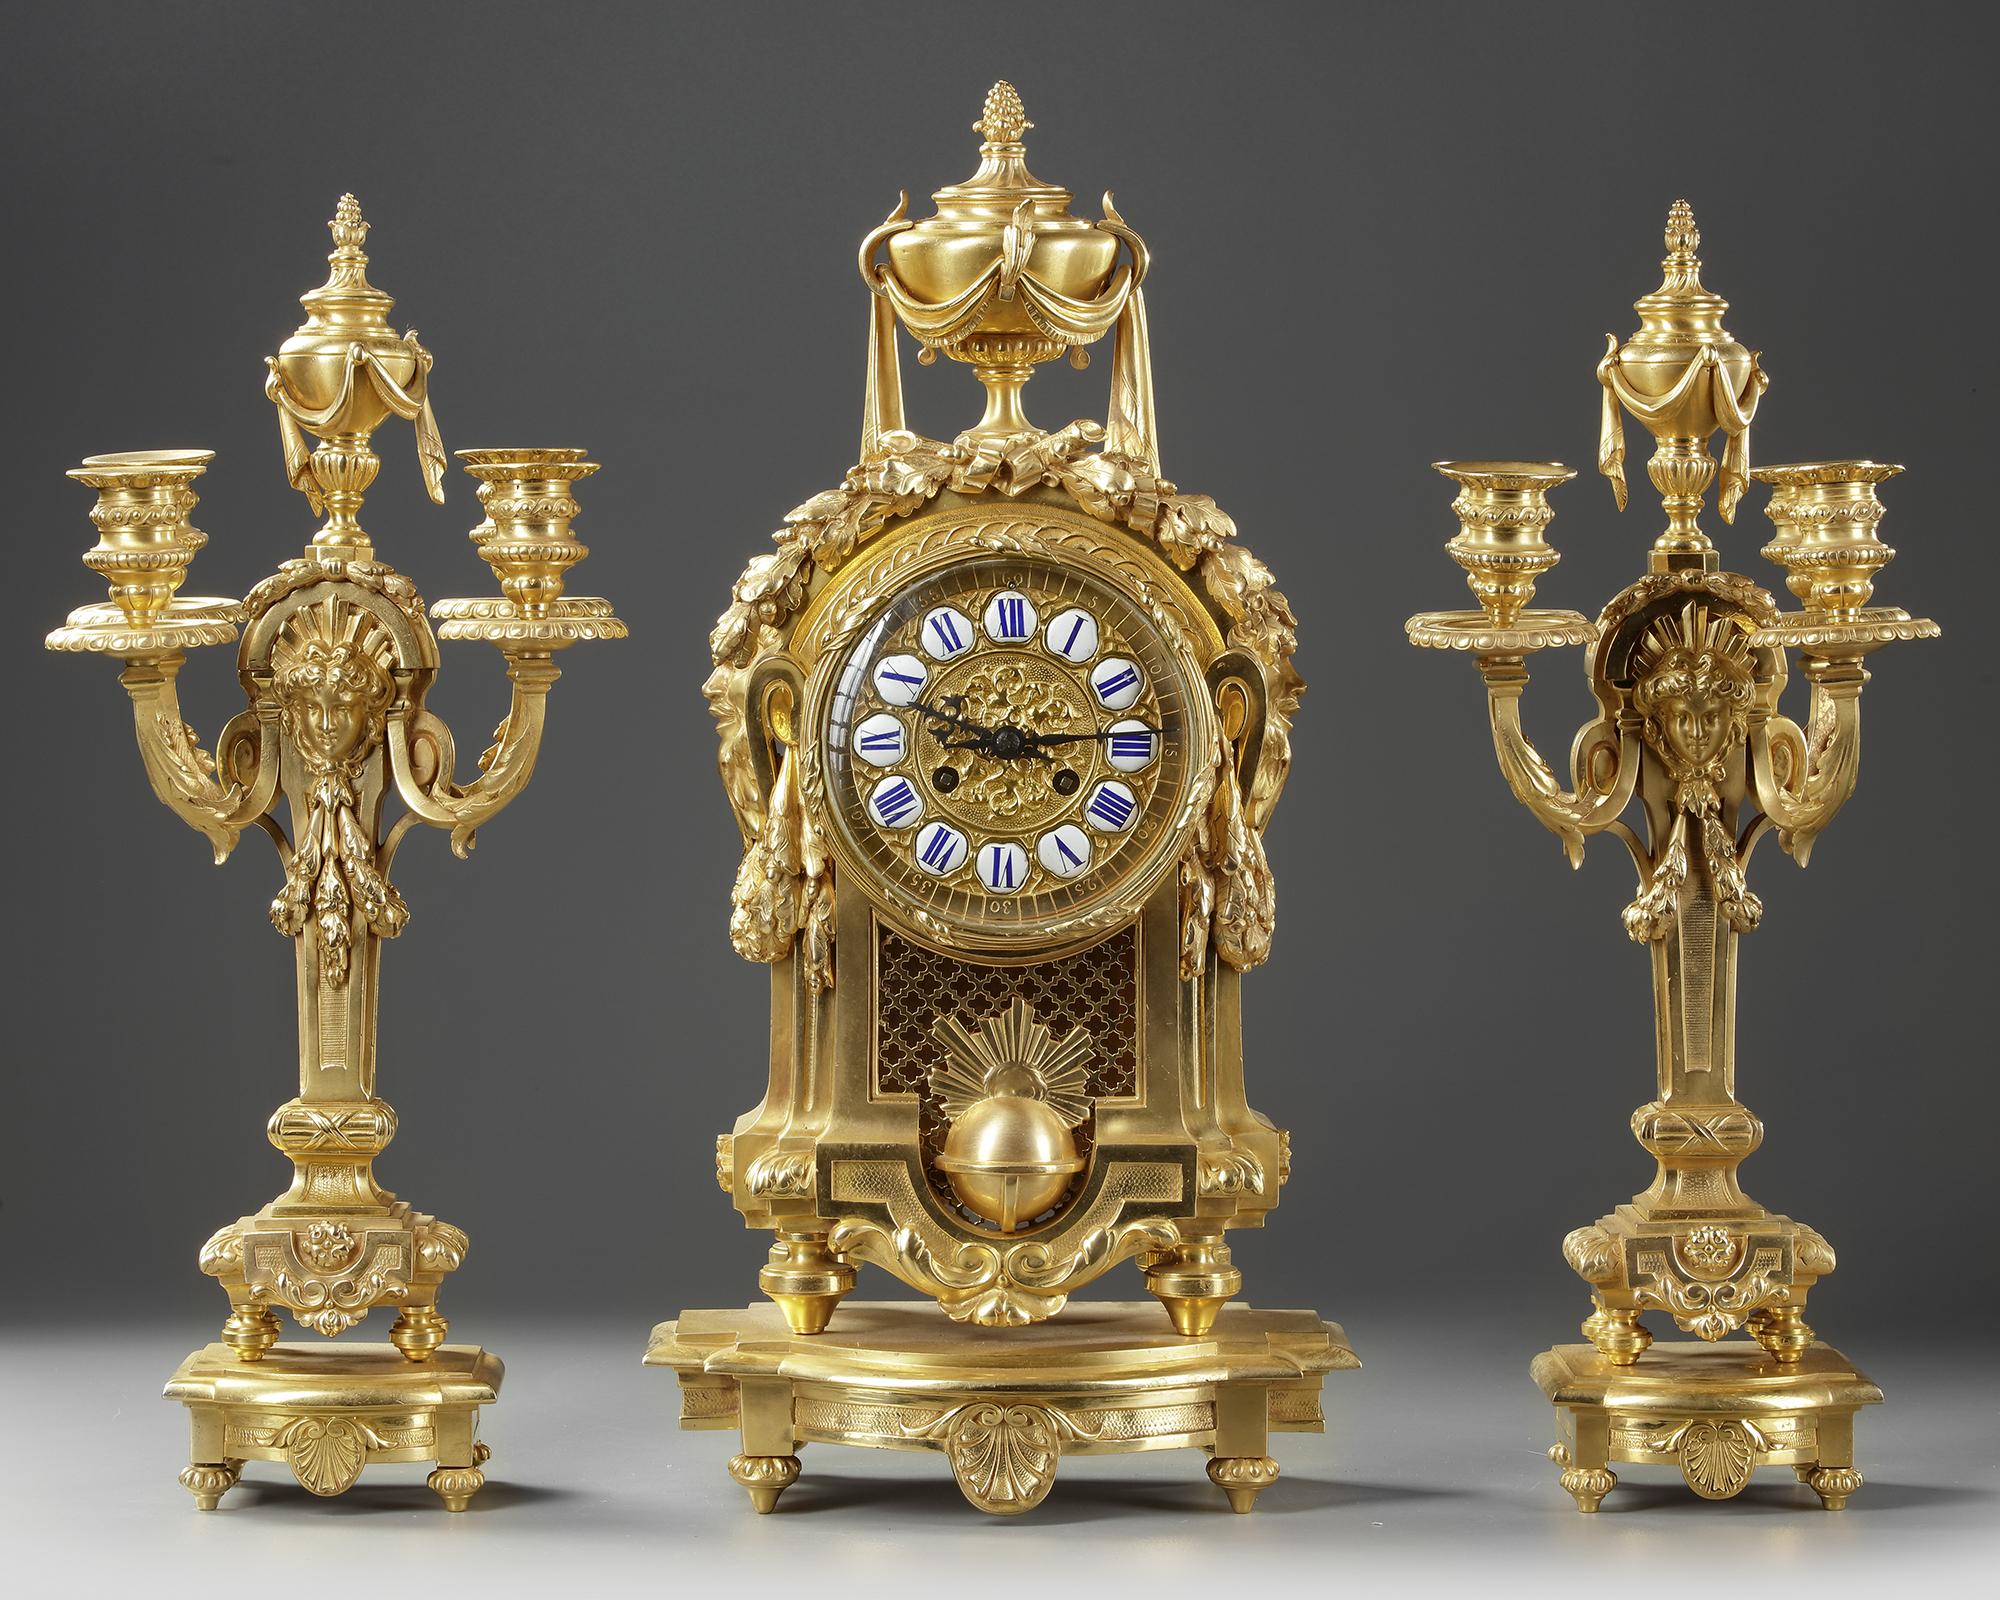 A FRENCH ORMOLU CLOCK SET, NAPOLEON III STYLE